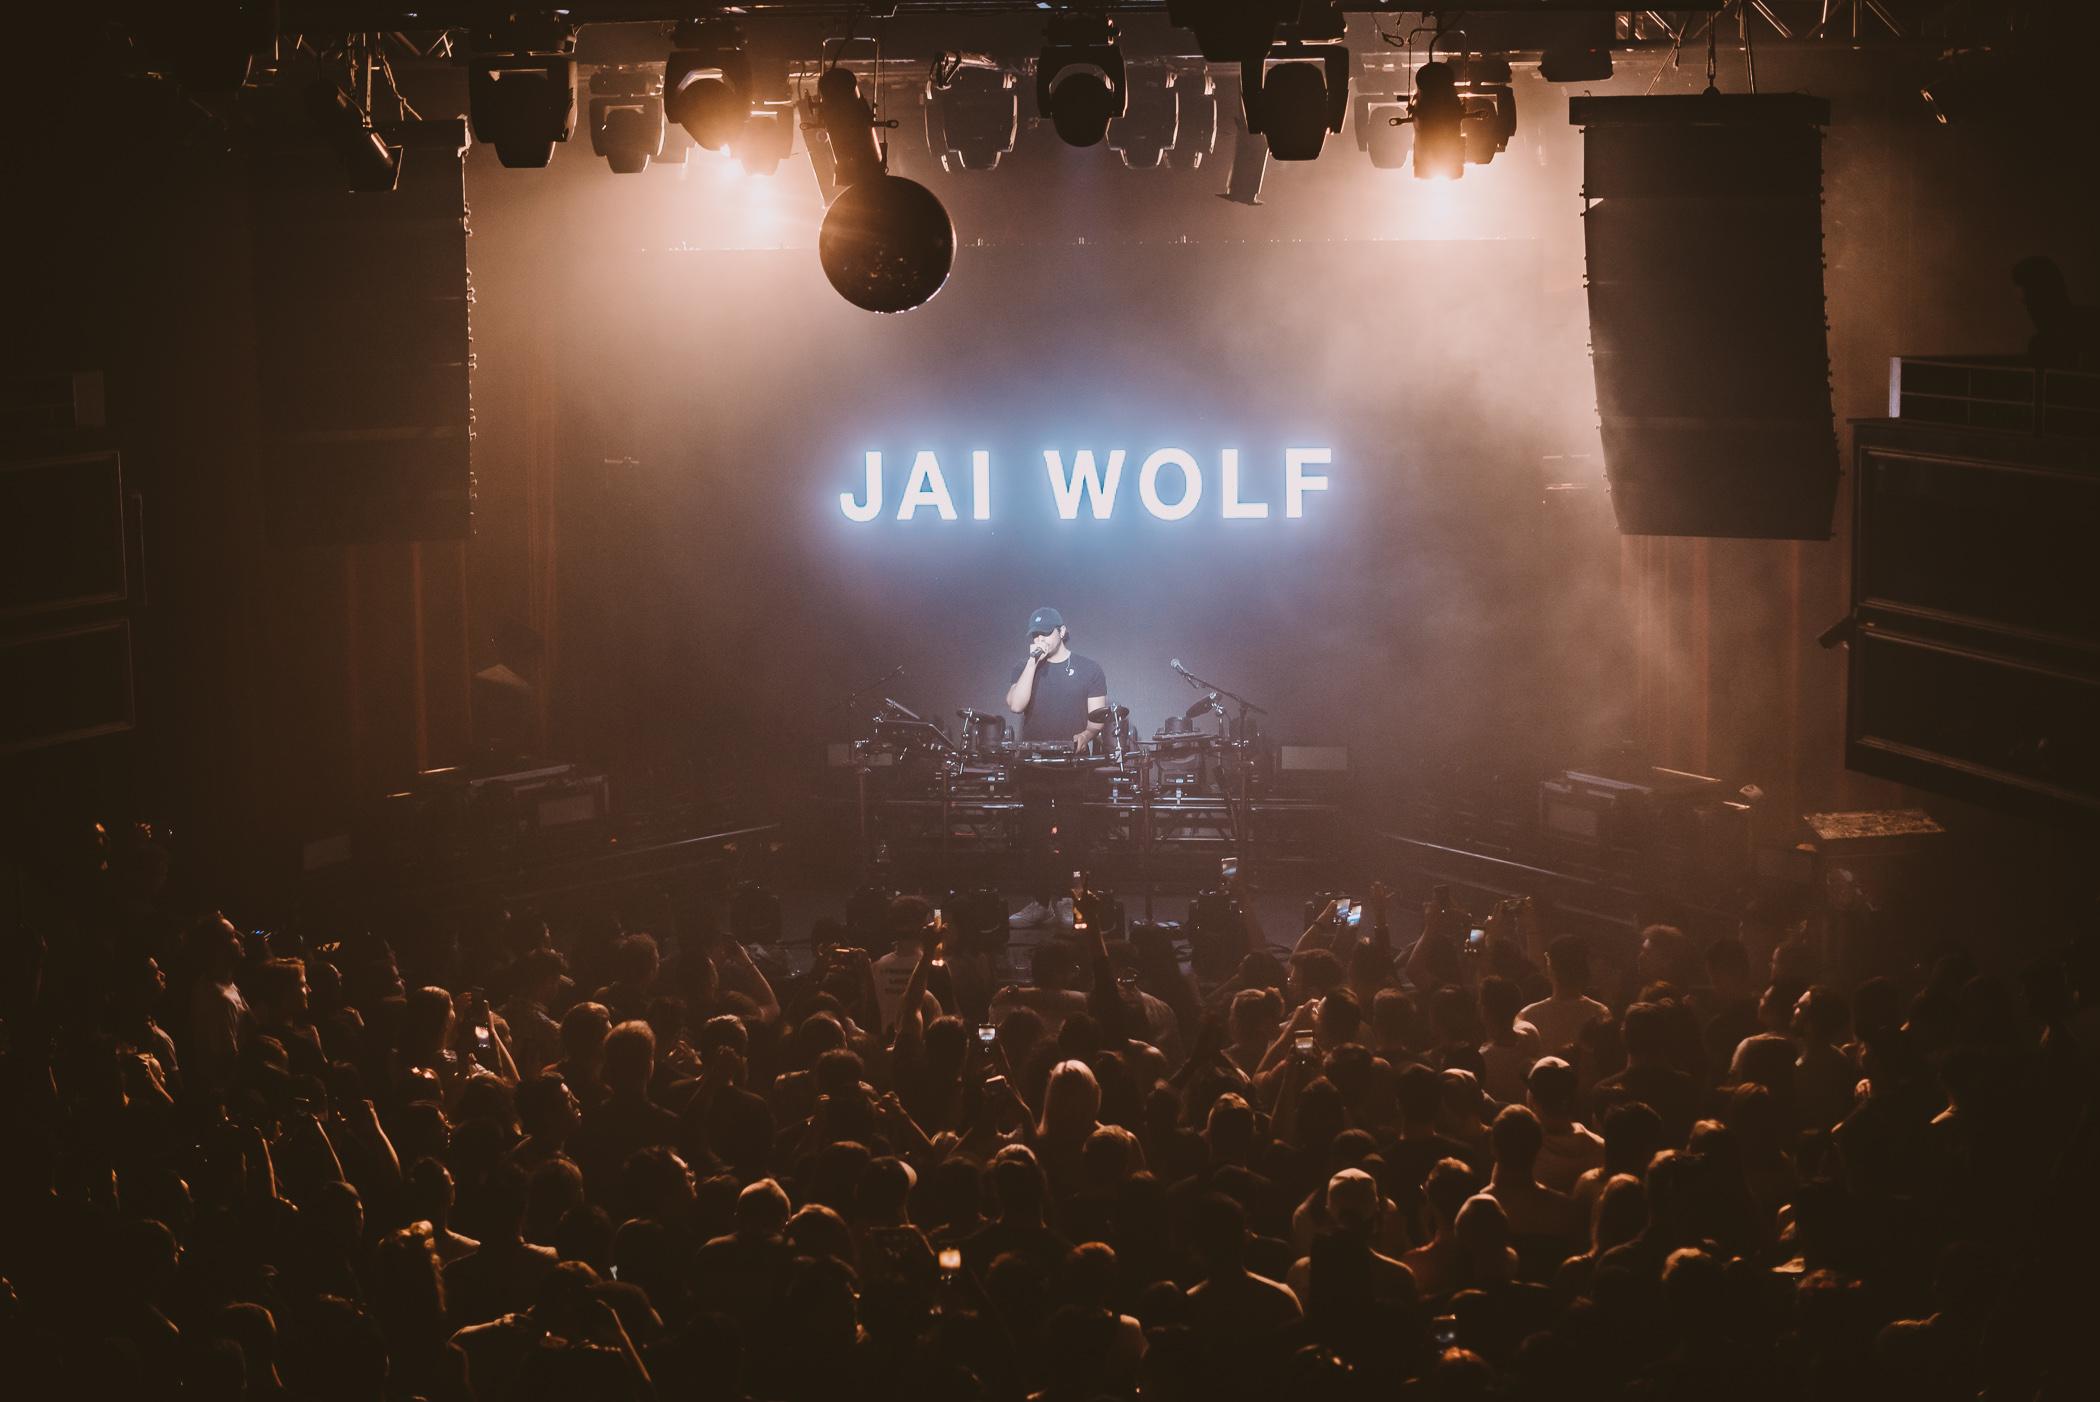 Jai_Wolf-VENUE-Timothy_Nguyen-20190508 (10 of 38).JPG